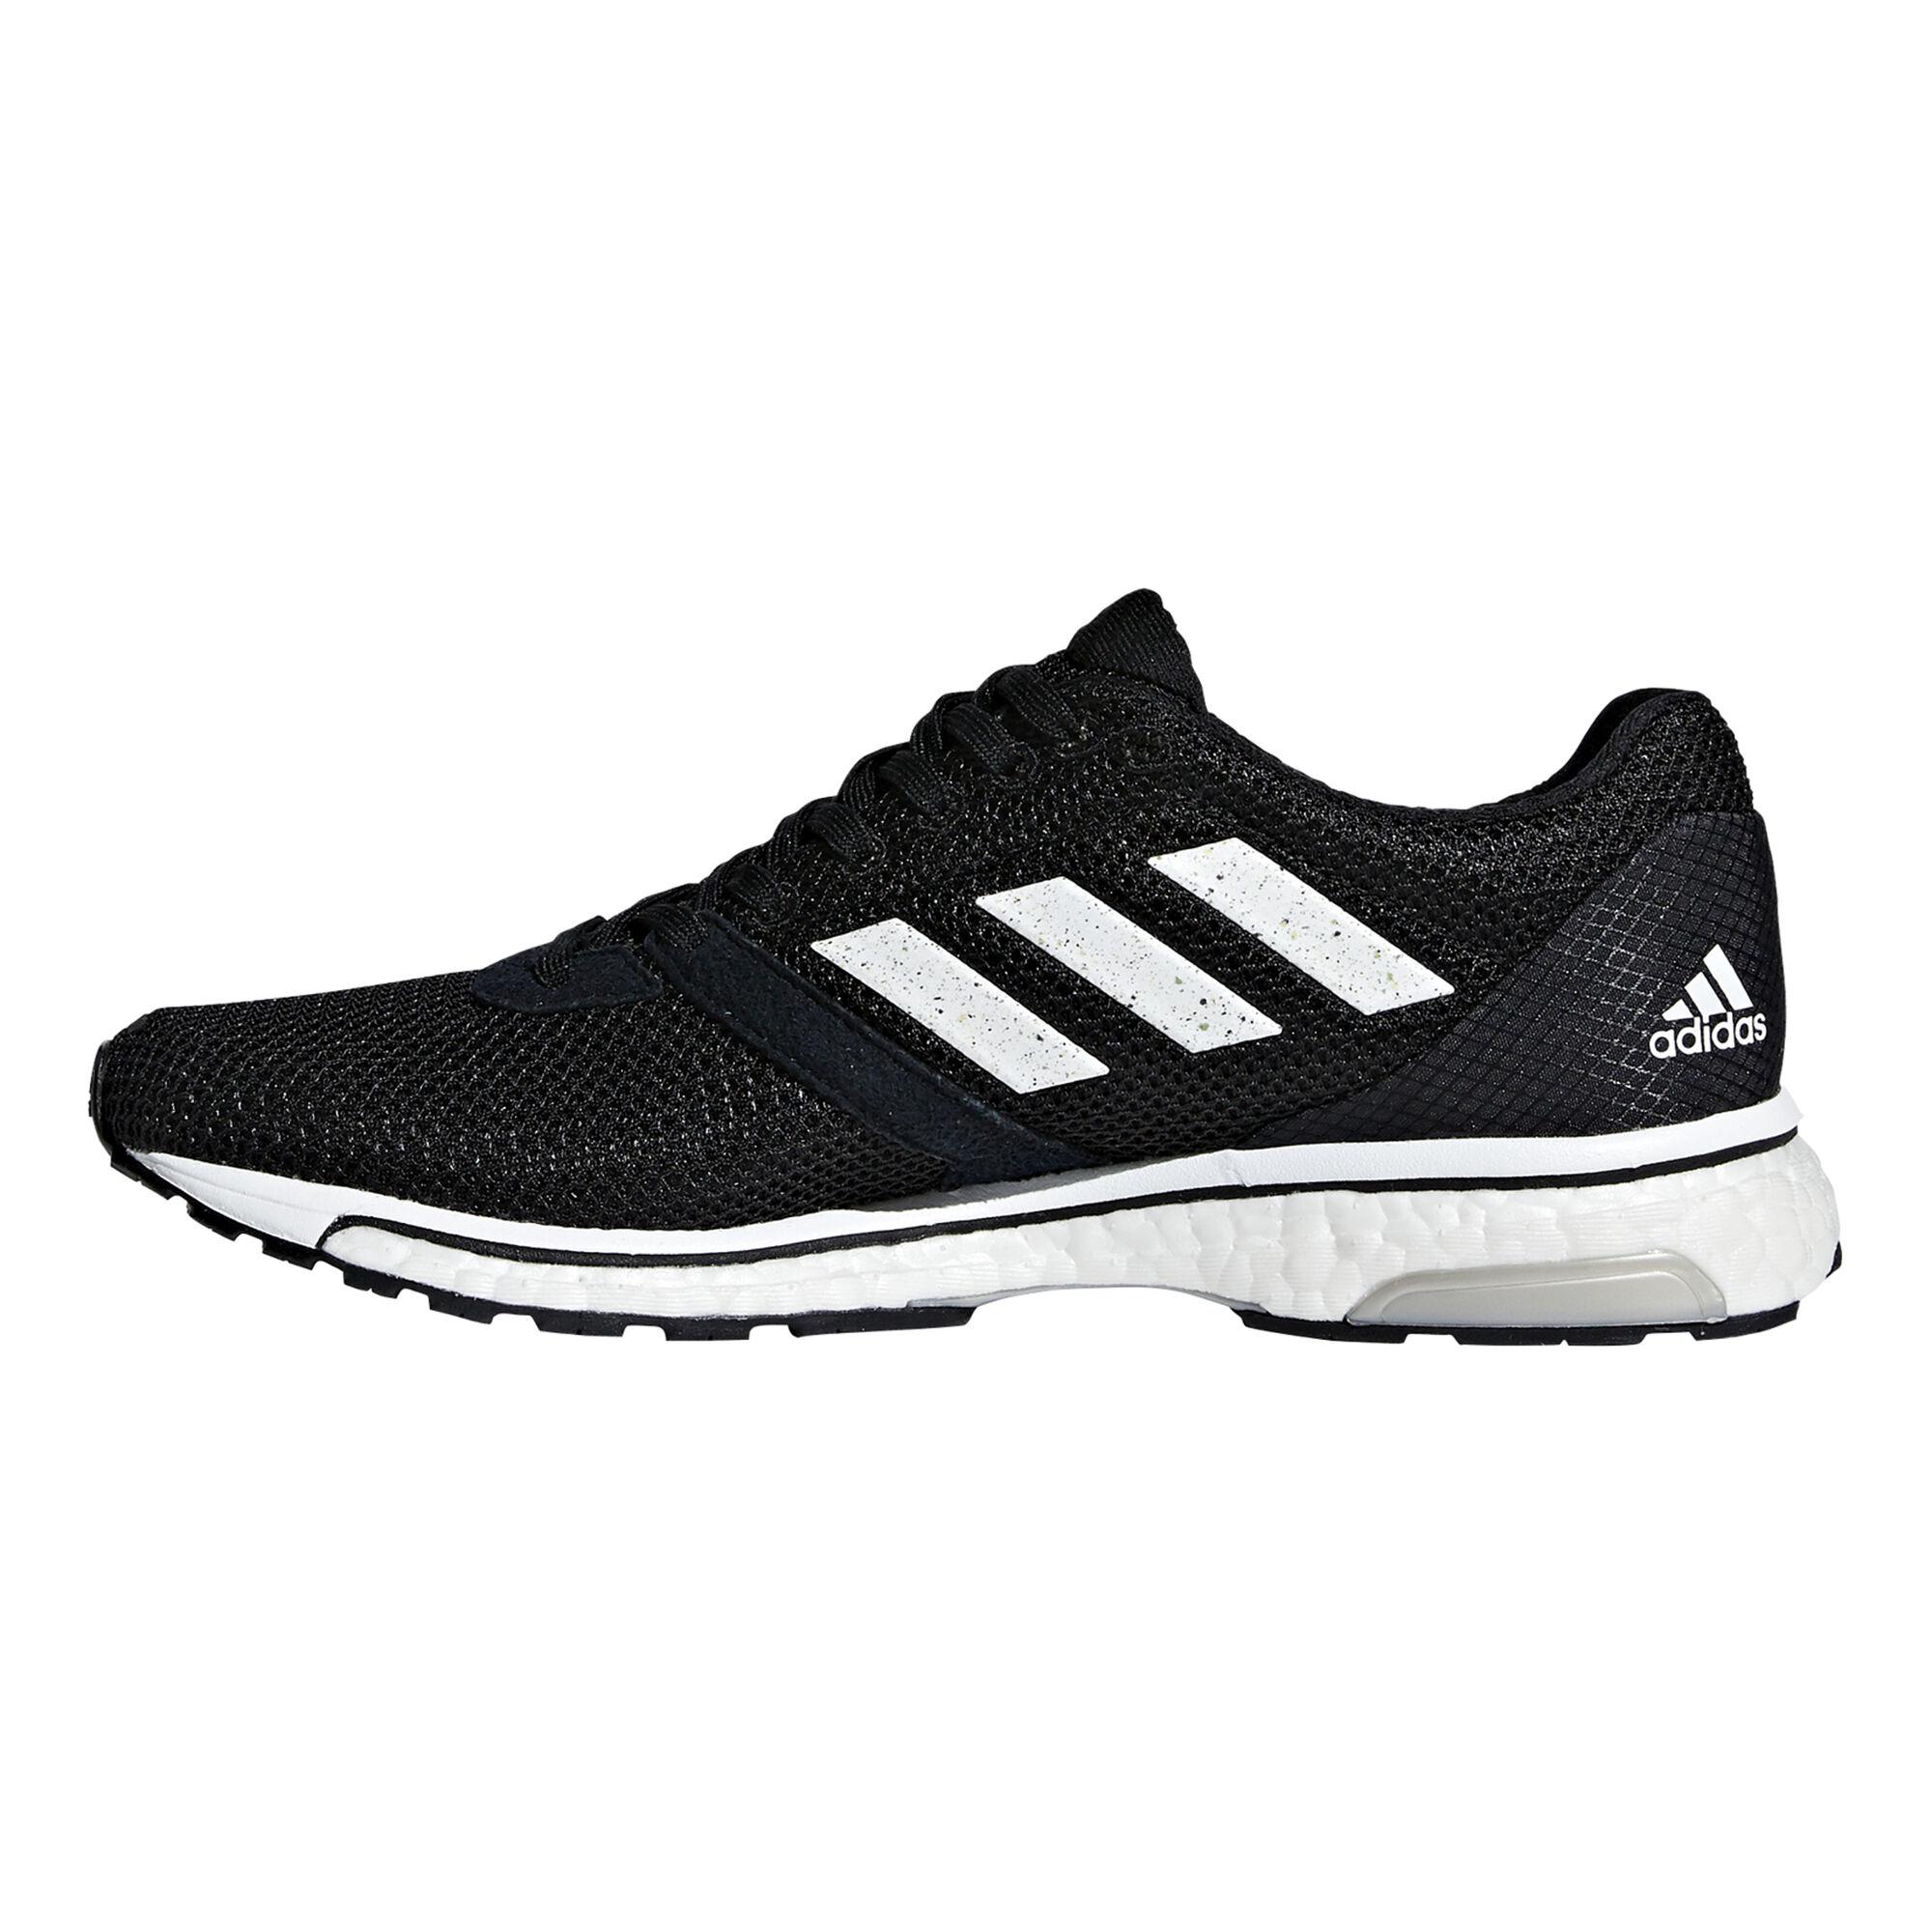 940beb91f5d82 buy adidas Adizero Adios 4 Competition Running Shoe Women - Black ...